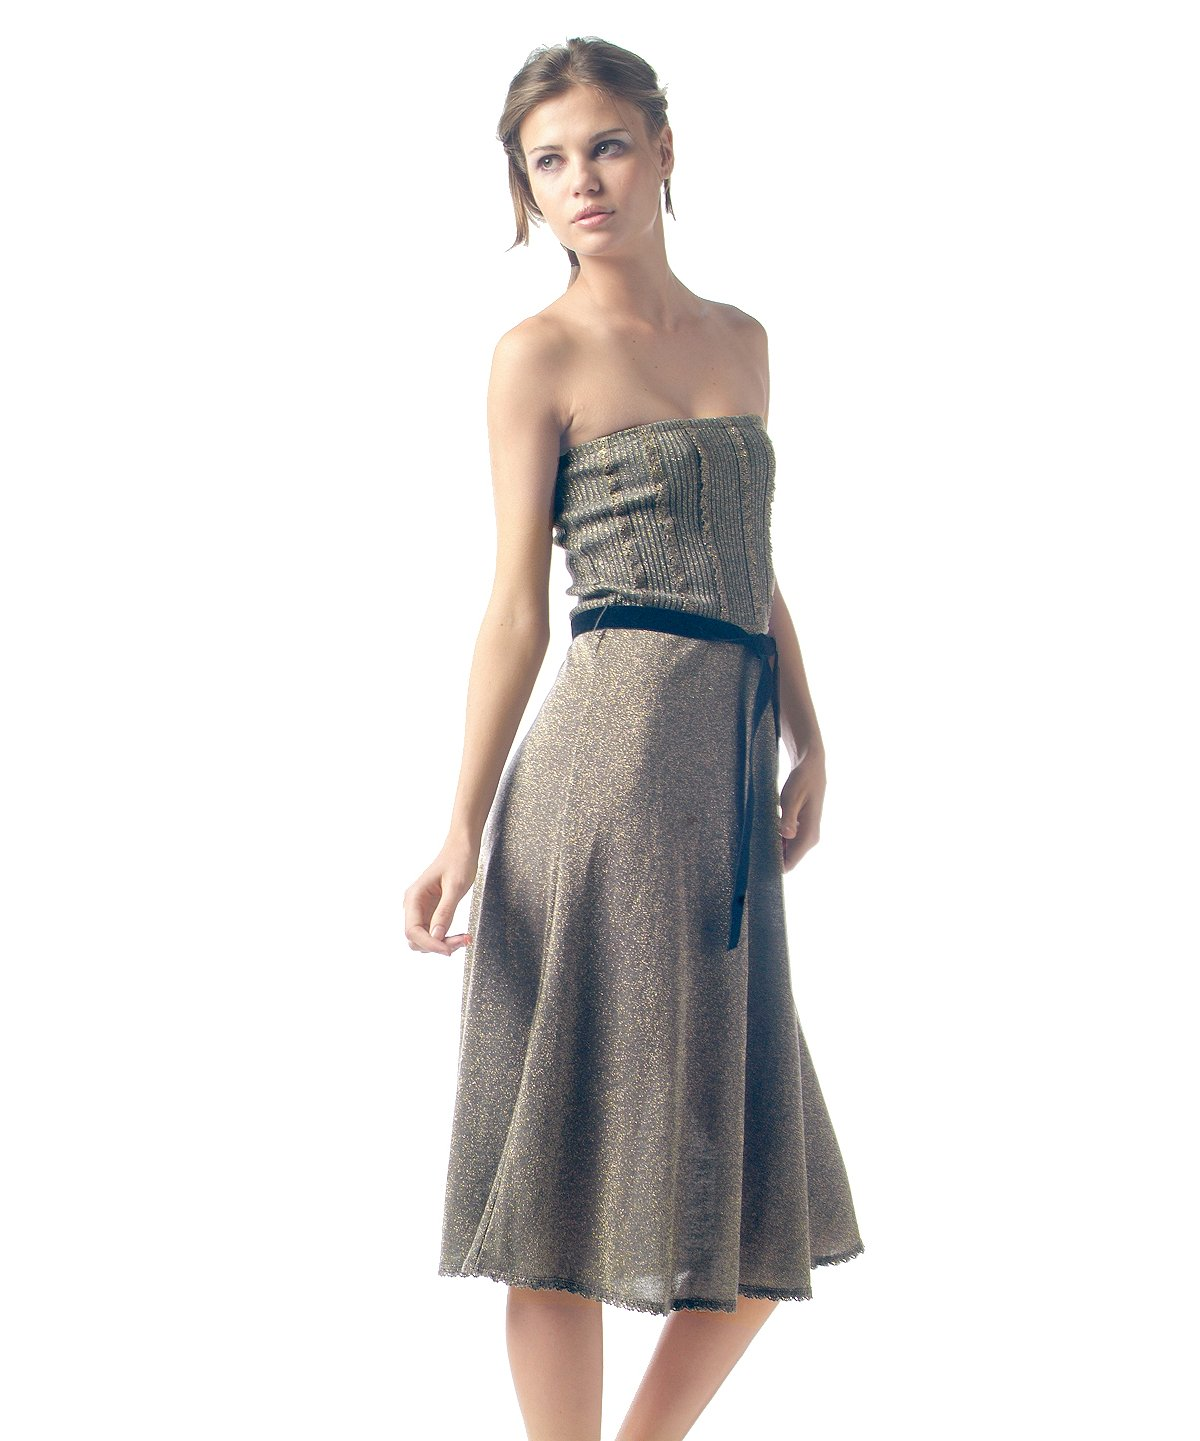 Sparkle Tube Dress